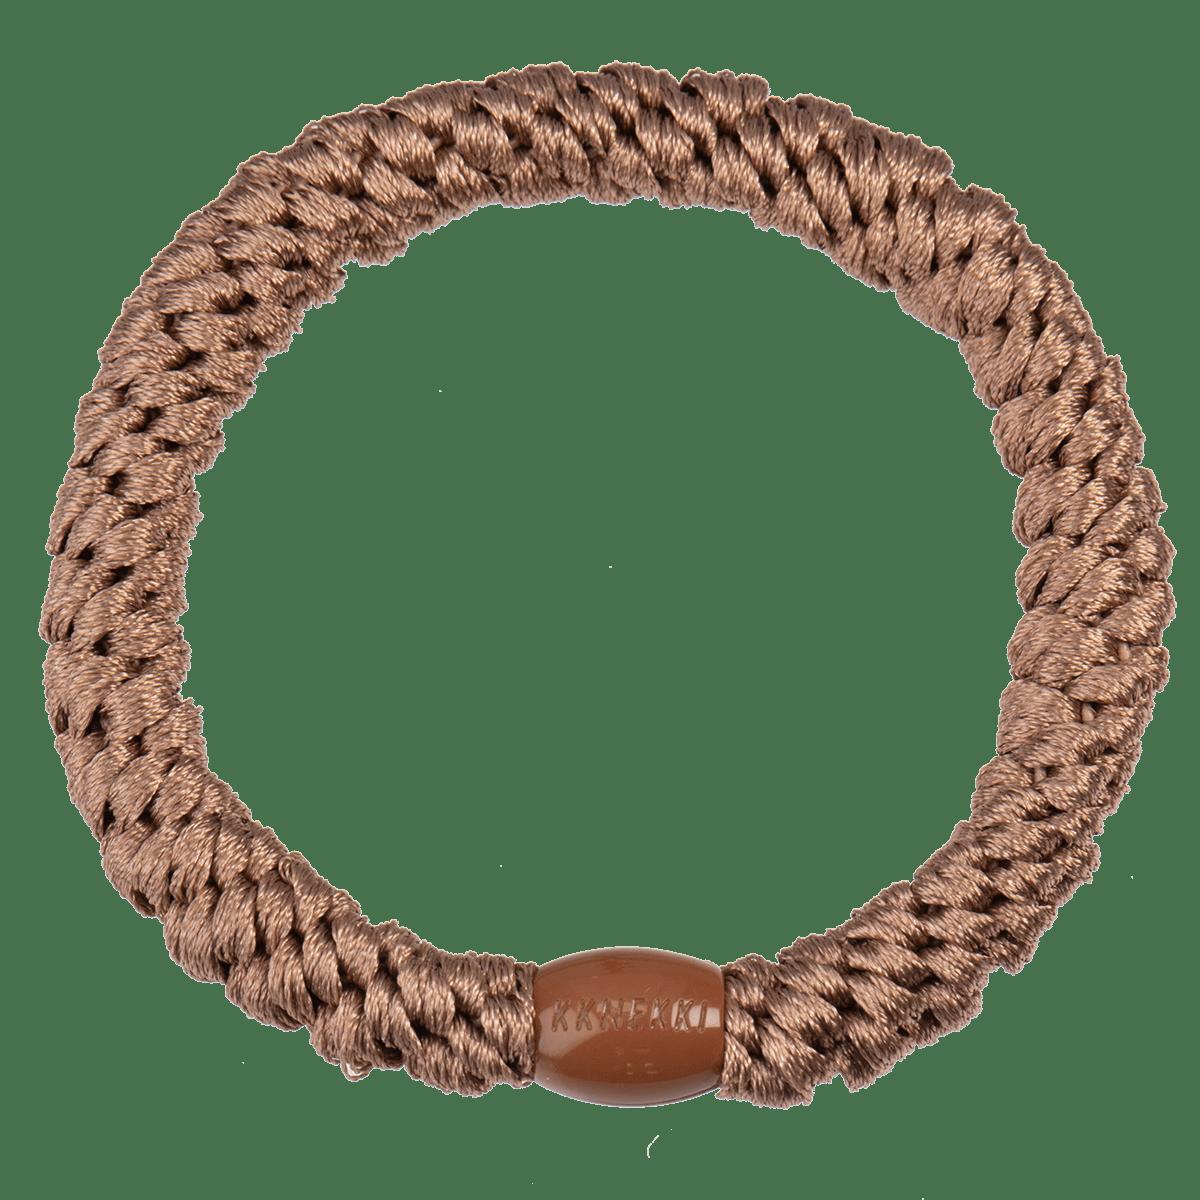 Haargummi / Armband - Nougat 5105 - KKNEKKI